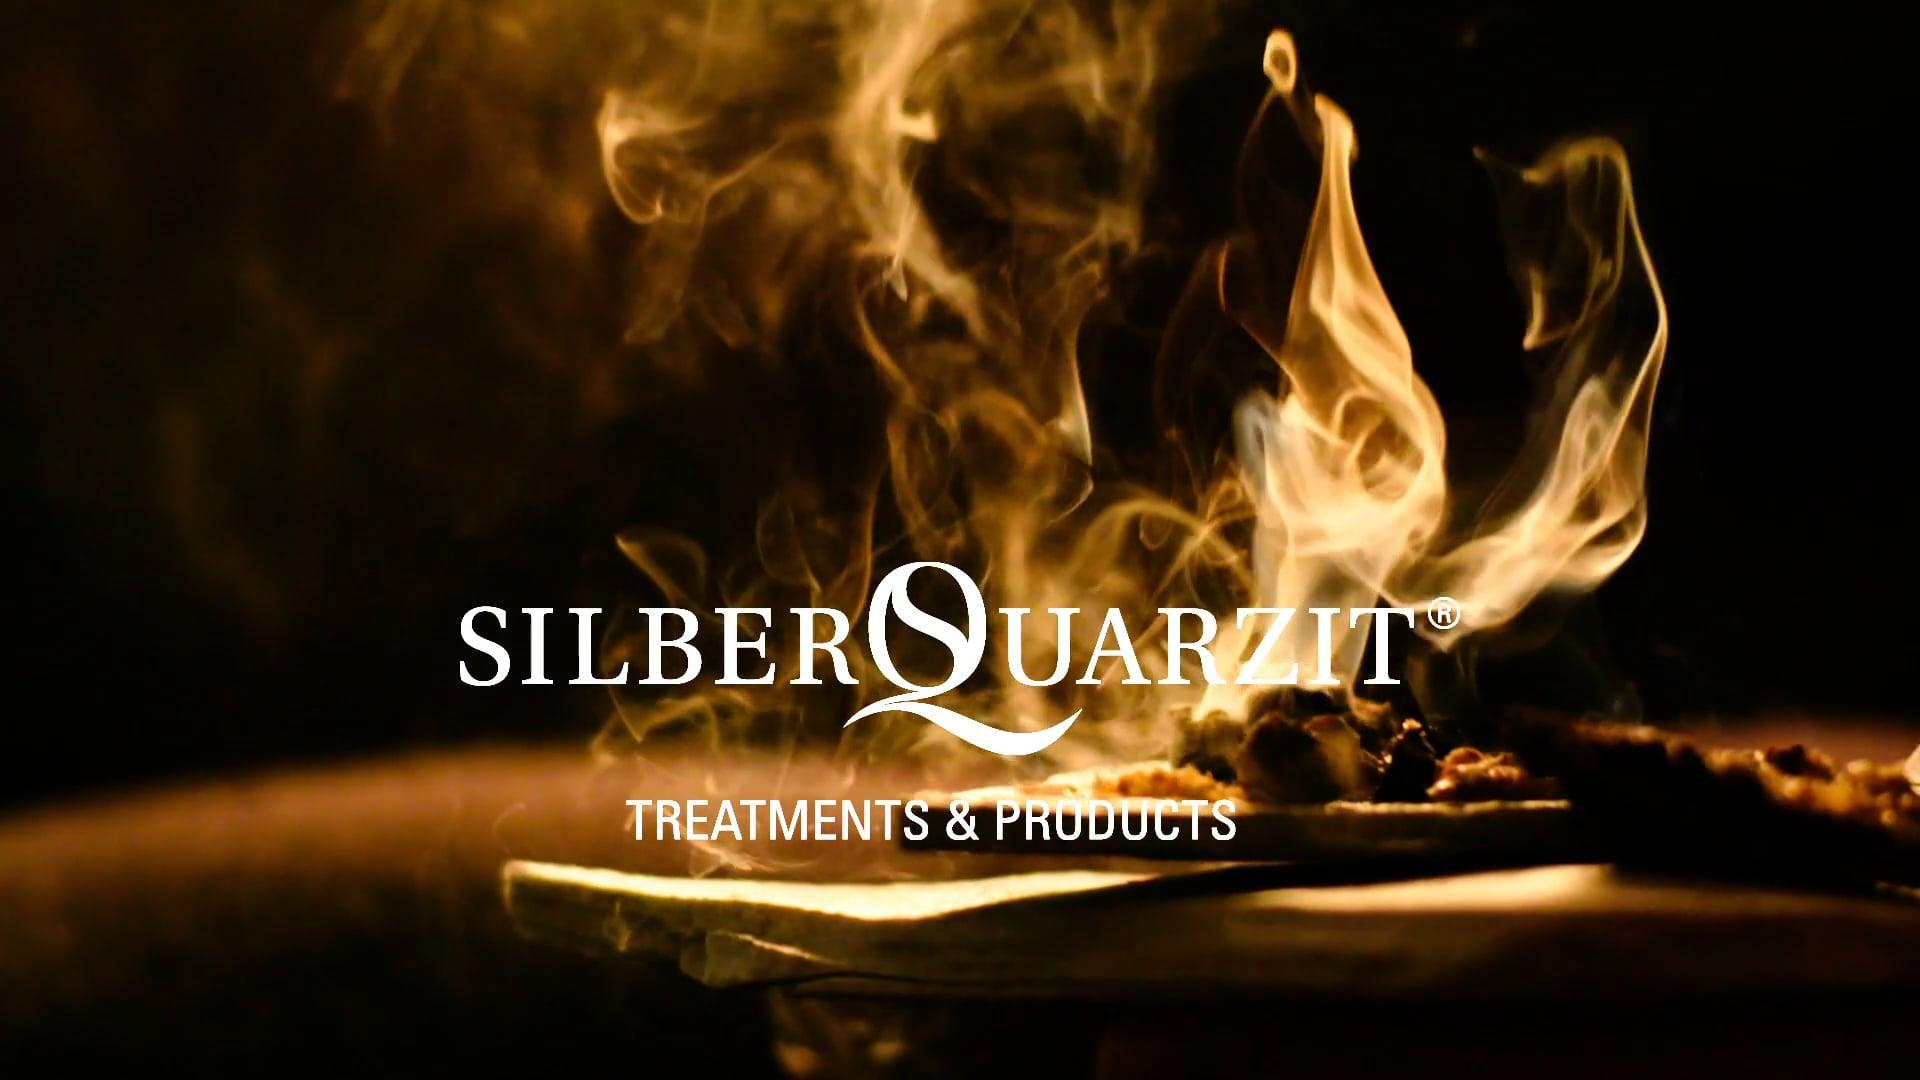 Silberquarzit short English